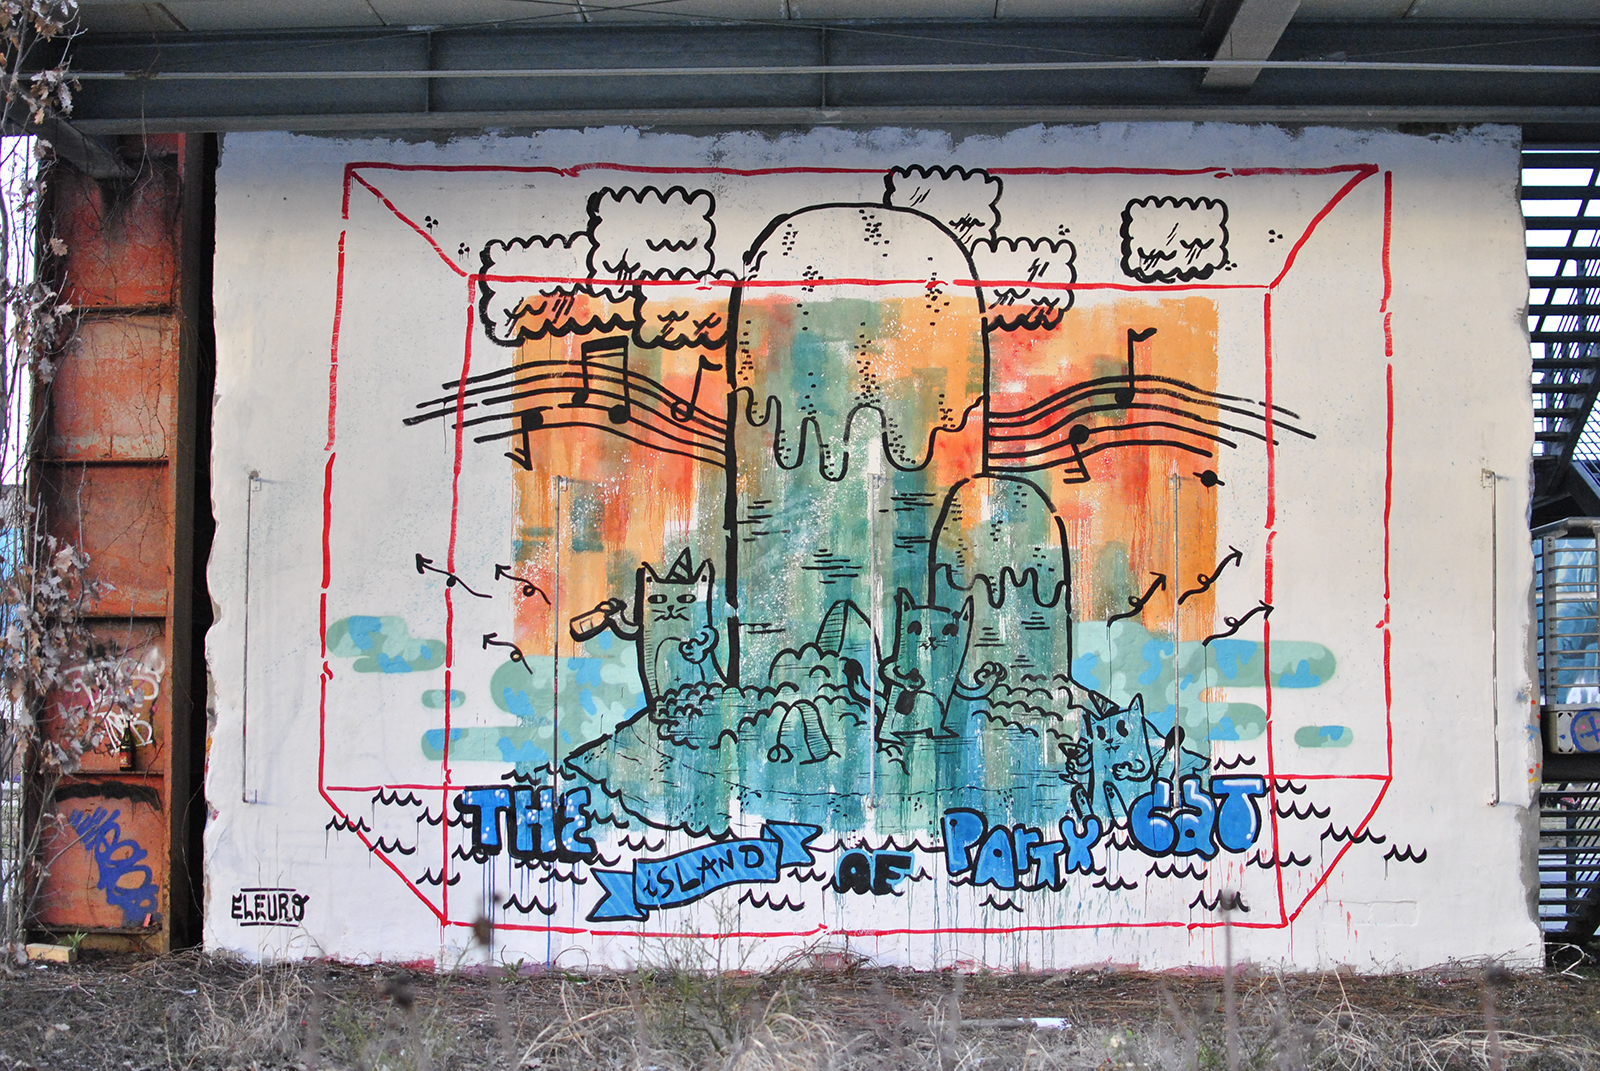 el-euro-new-mural-at-parco-dora-torino-01